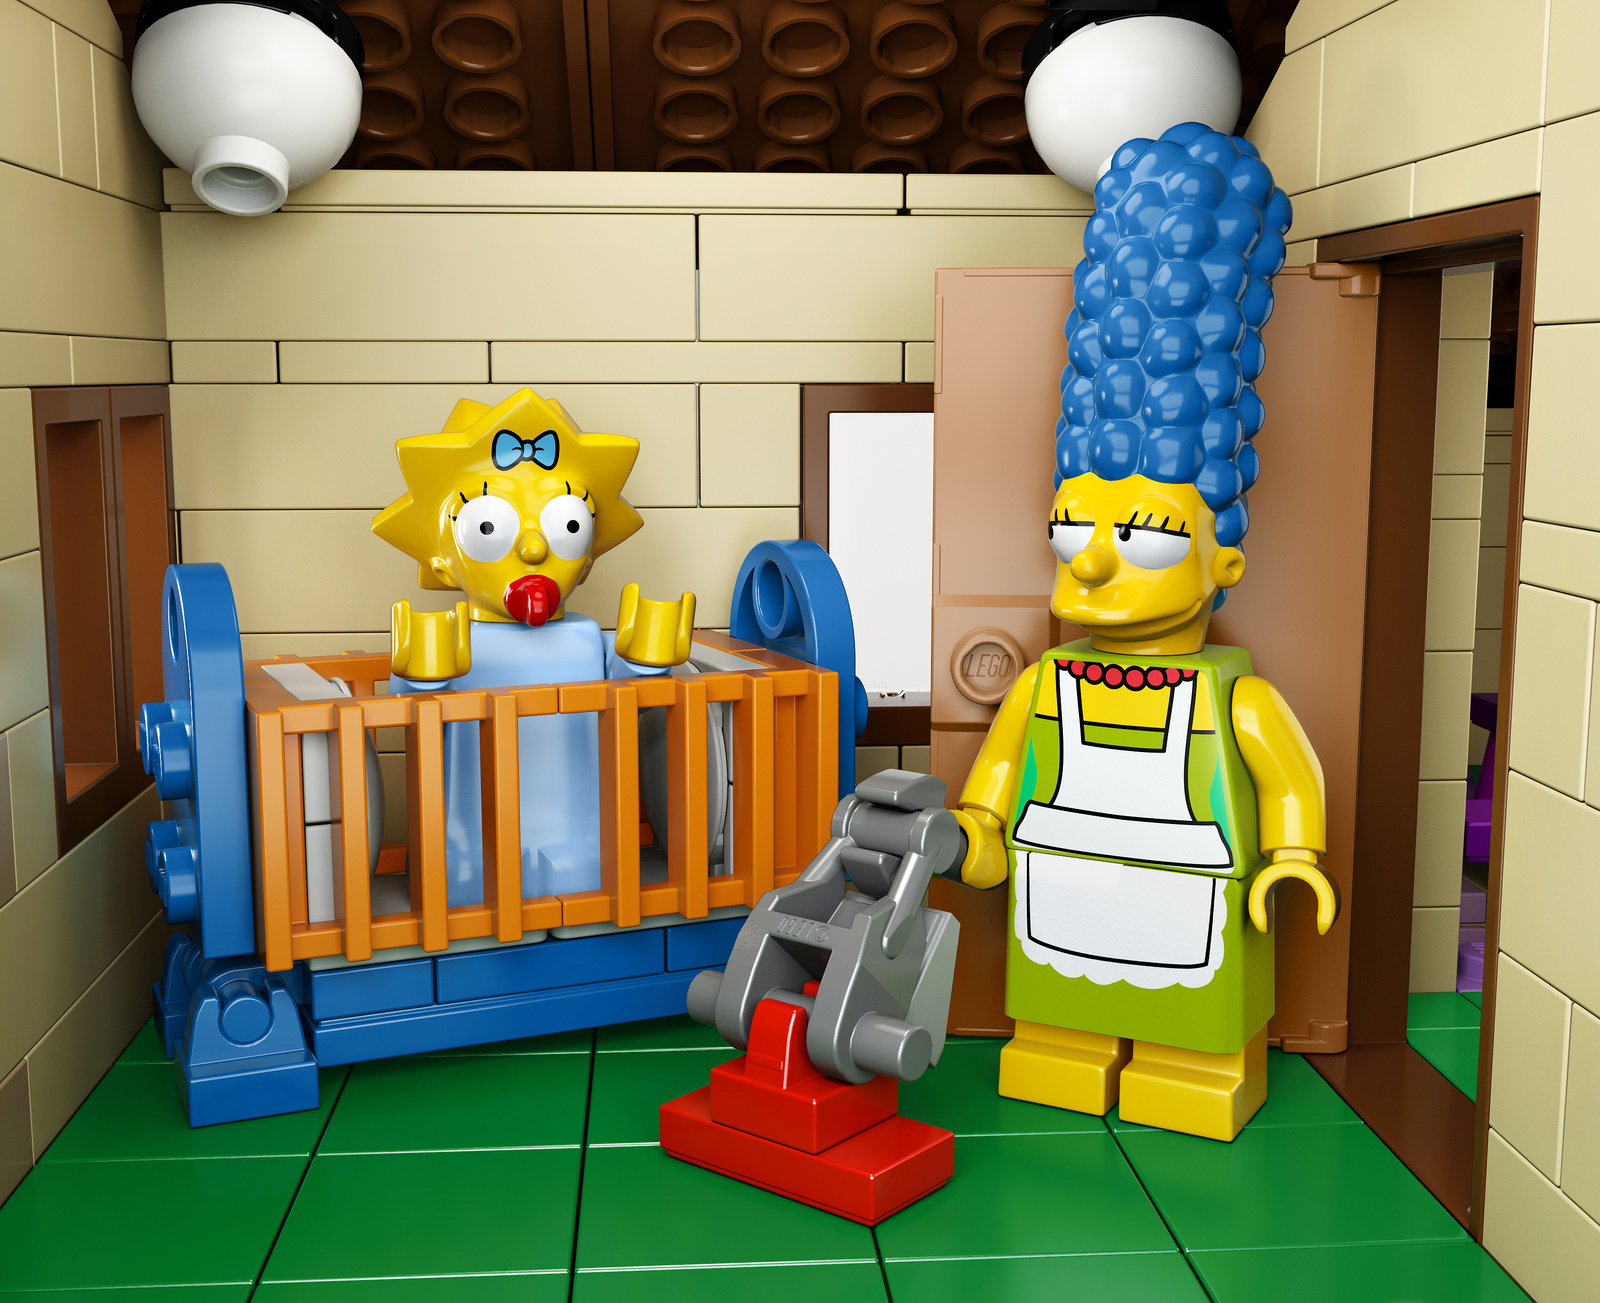 Maison-Lego-Simpsons-011